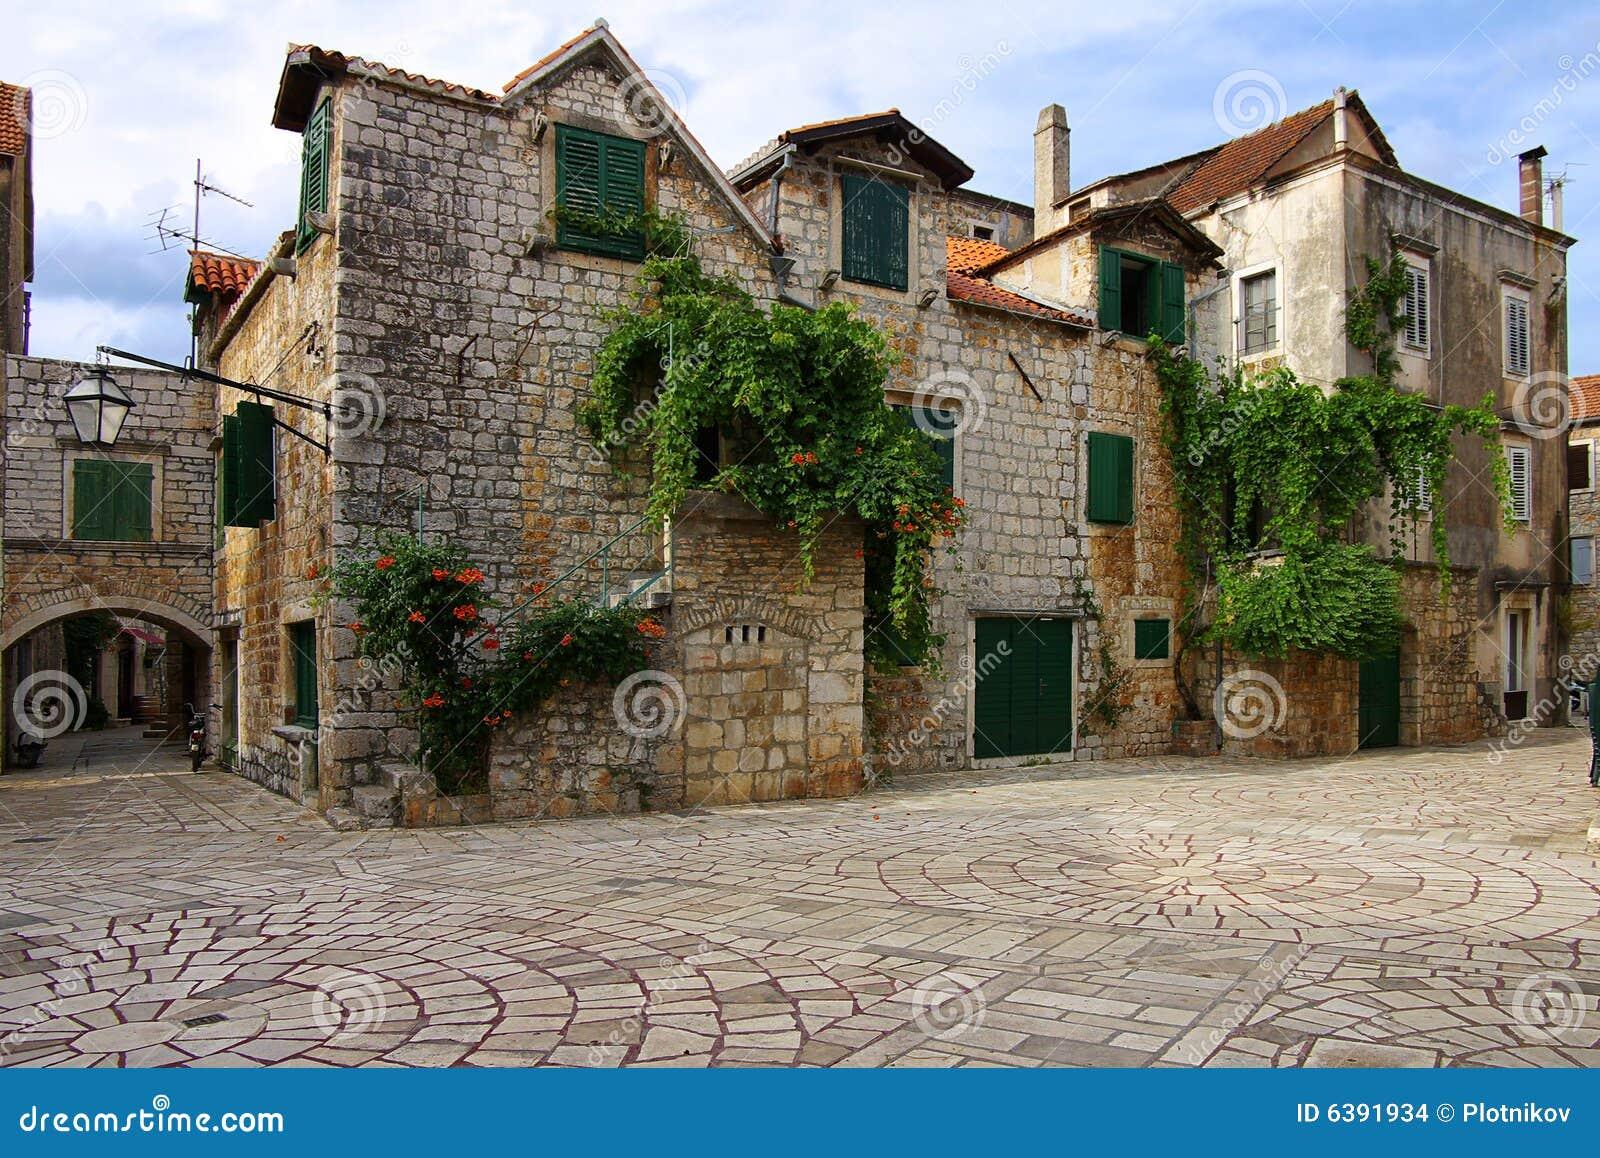 Old Courtyard on the Starigrad, Croatia